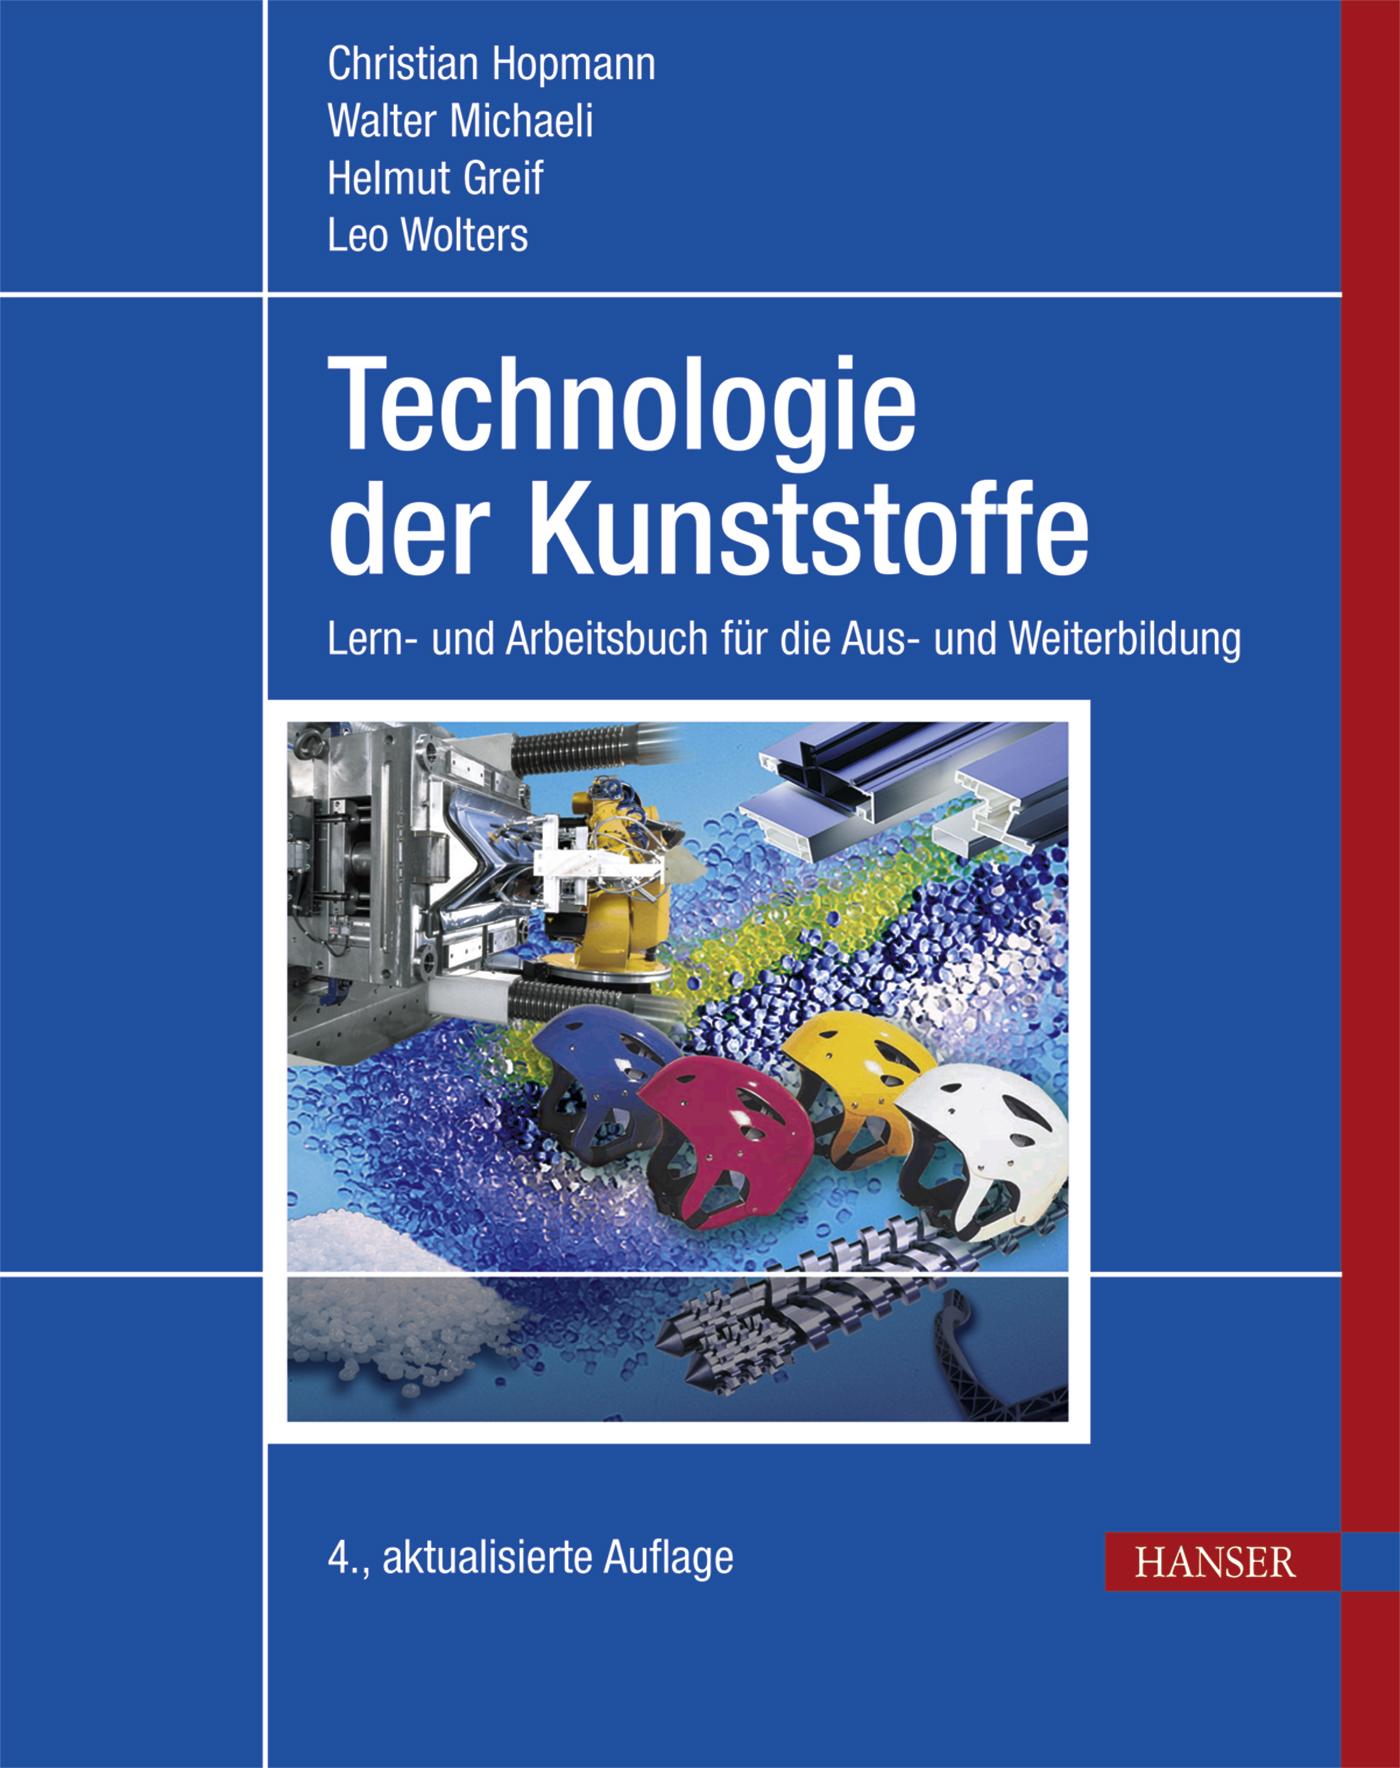 Hopmann, Michaeli, Greif, Wolters, Technologie der Kunststoffe, 978-3-446-44233-7